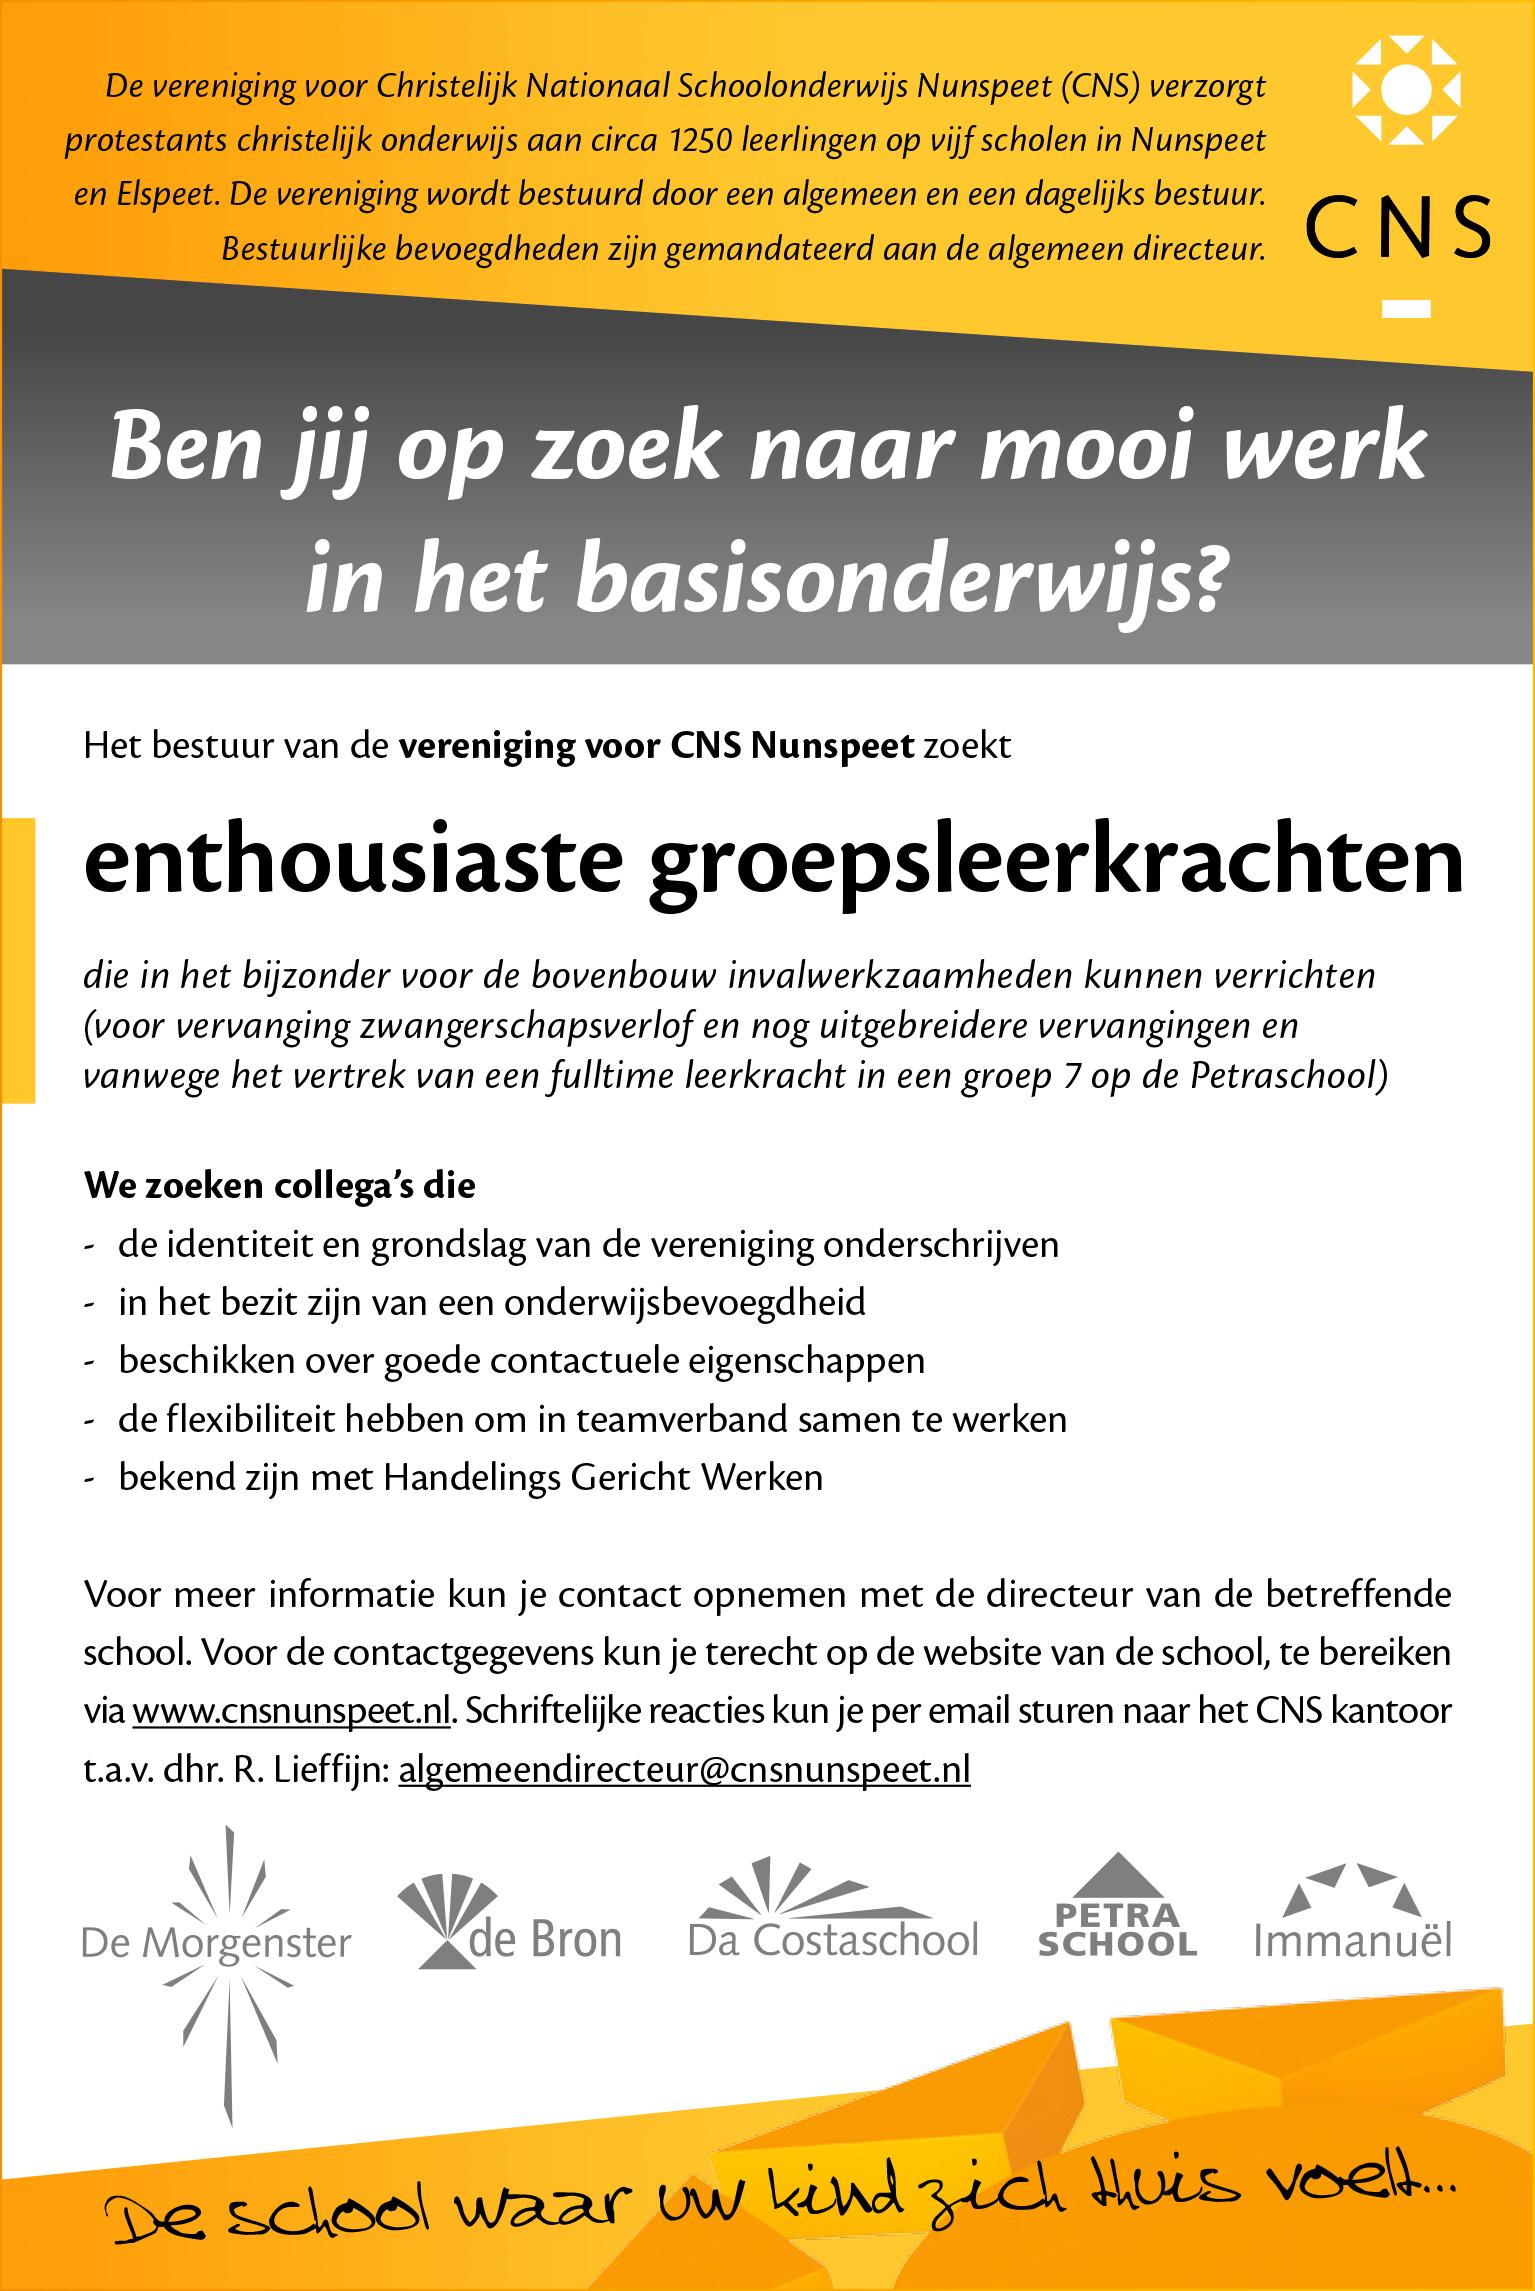 16010cns-adv-groepsleerkracht-c3-website